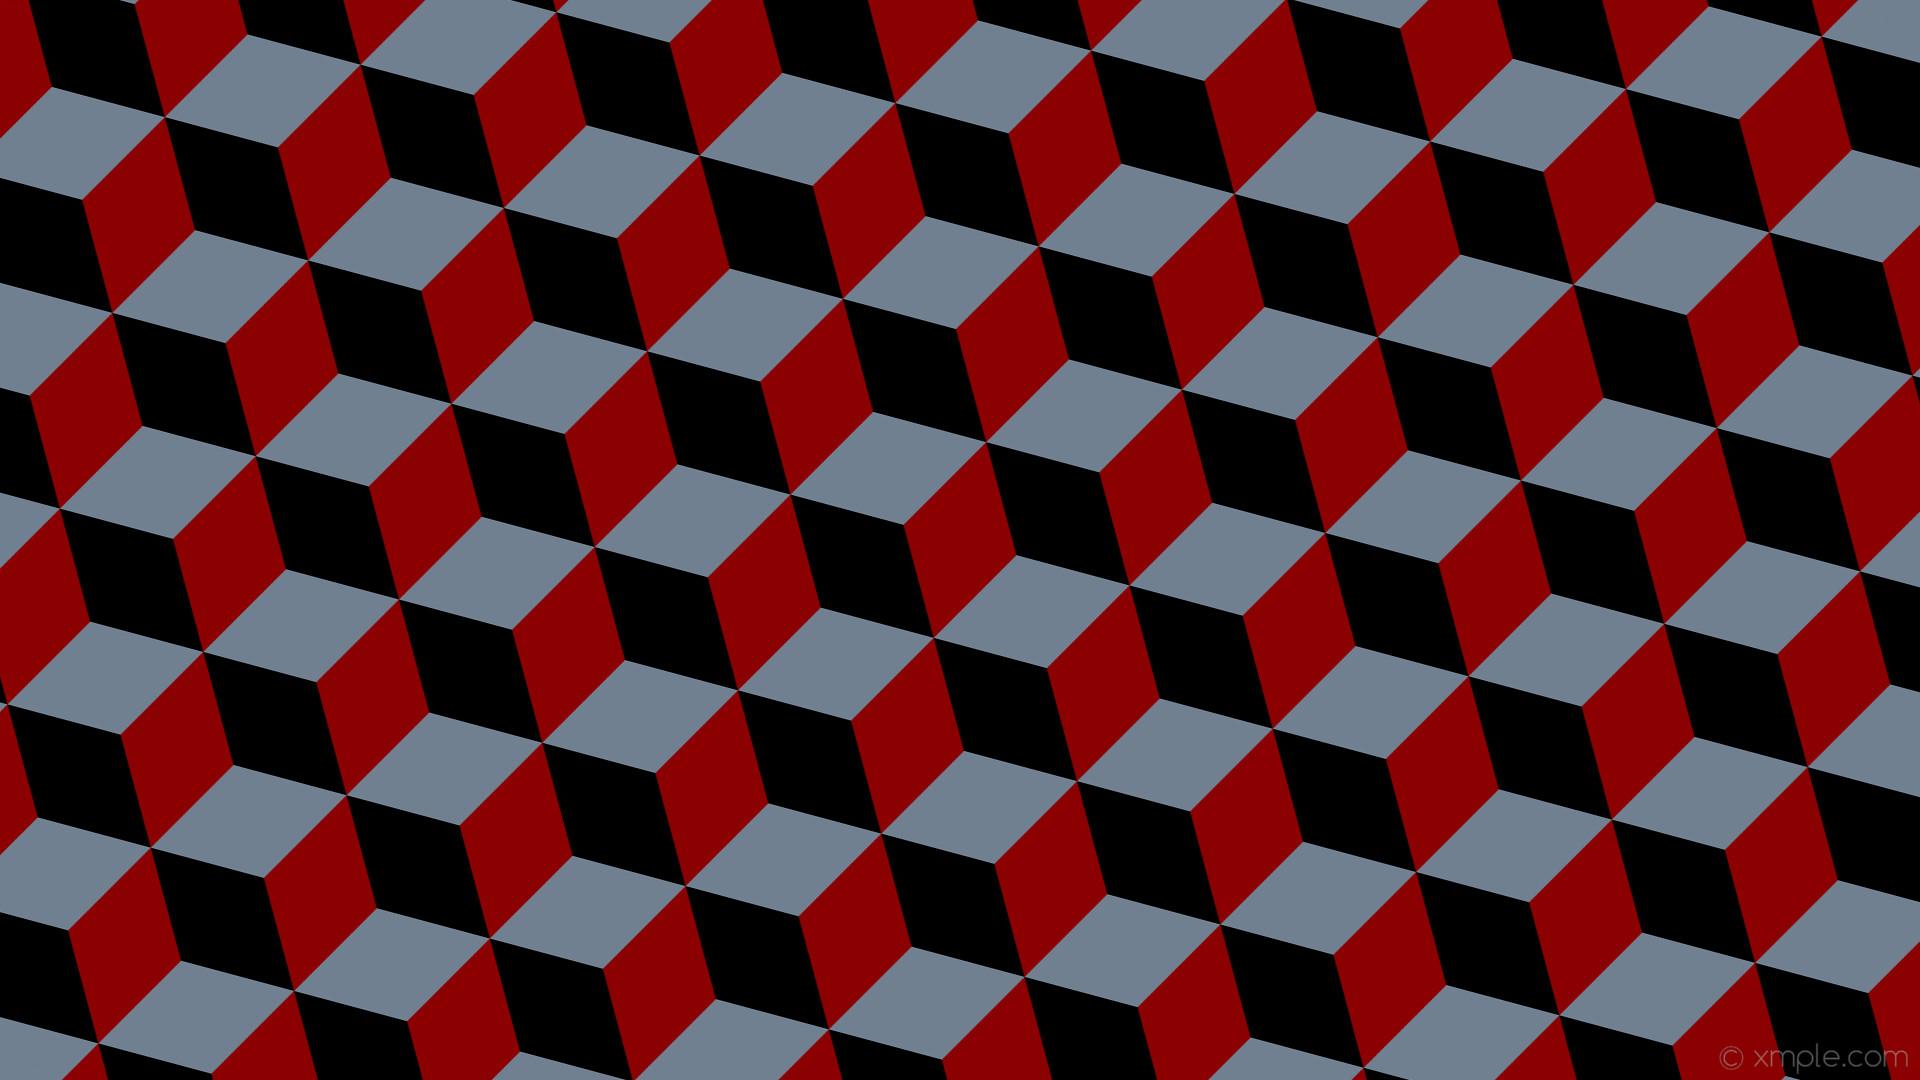 wallpaper grey 3d cubes red black dark red slate gray #8b0000 #708090  #000000